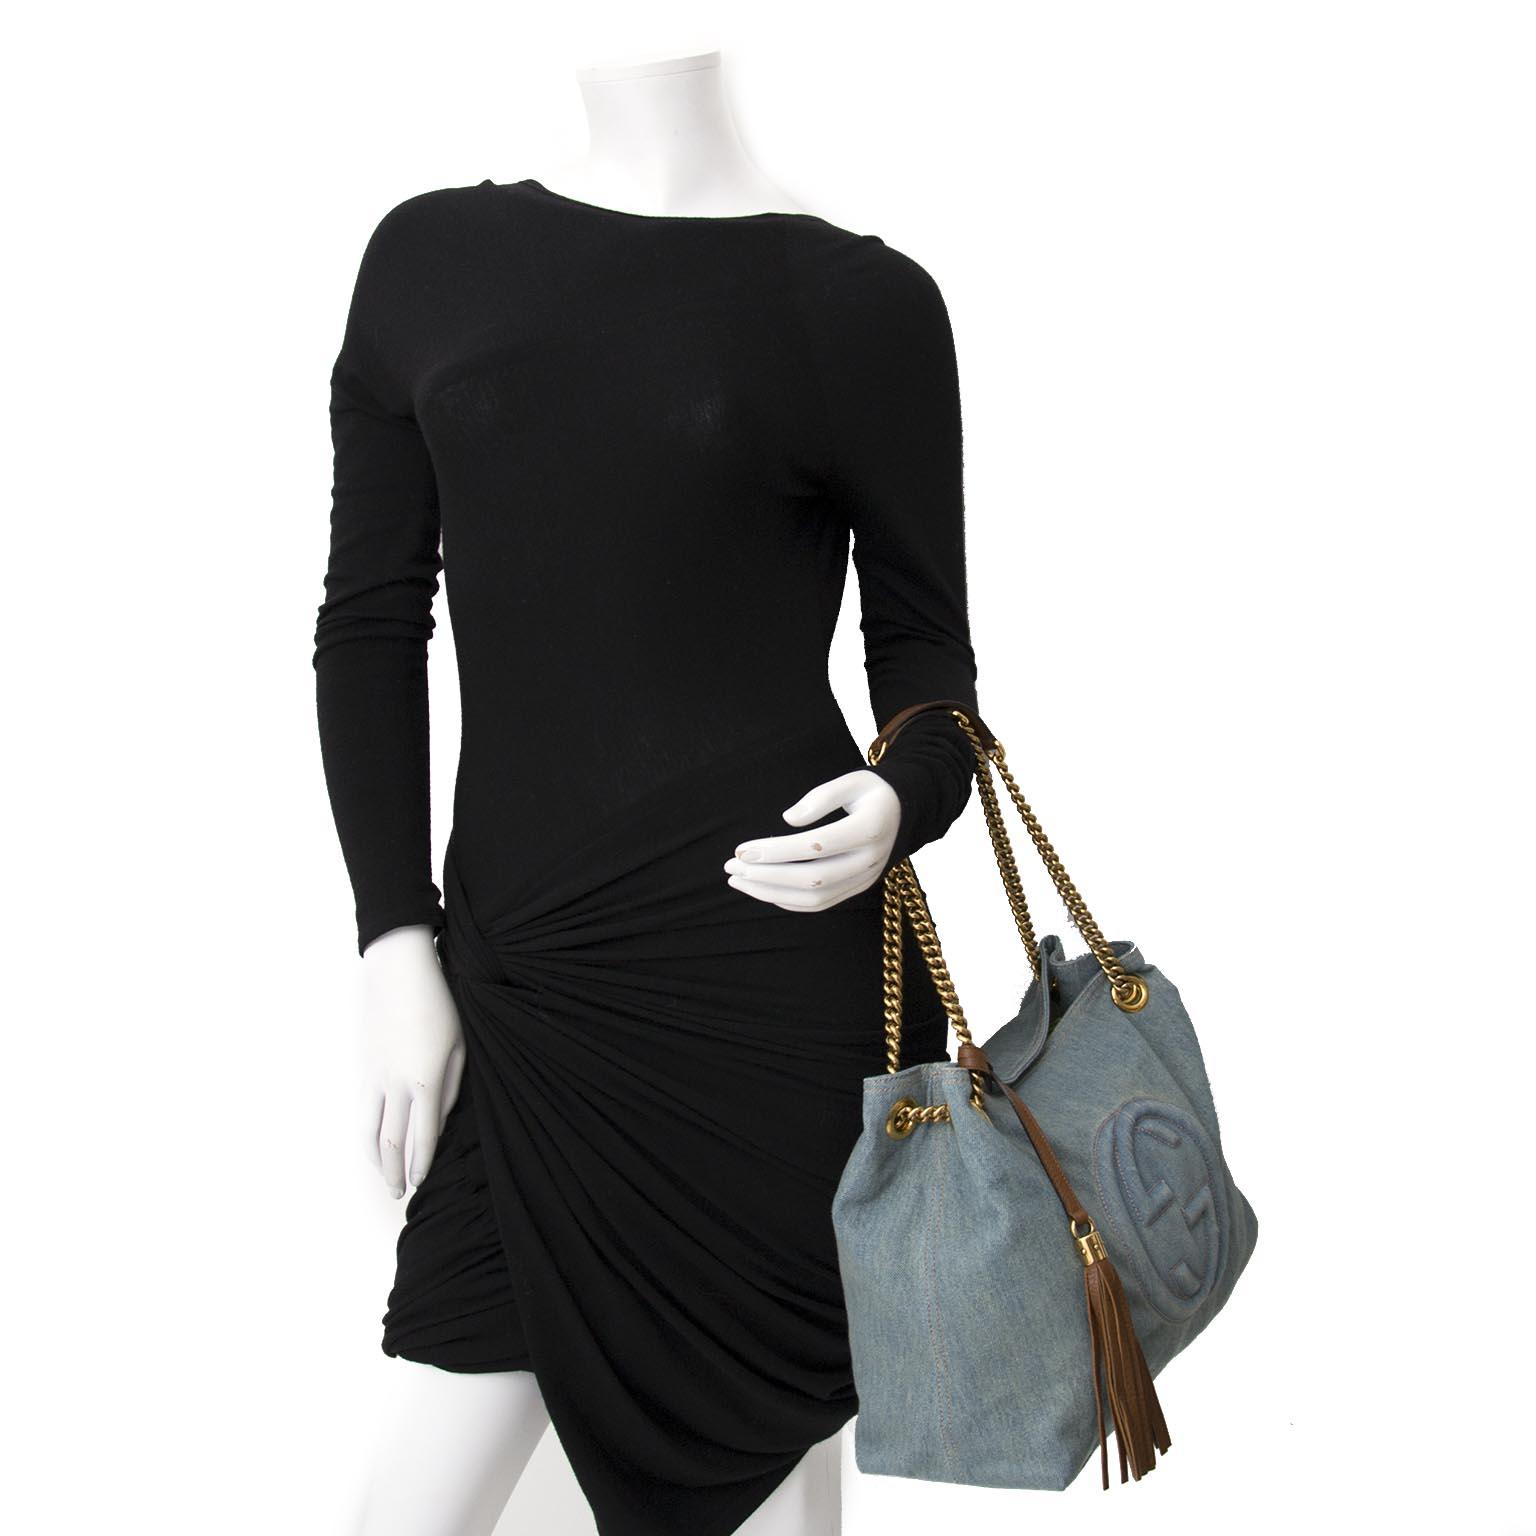 Koop Gucci Soho Medium Blue Denim Tote online